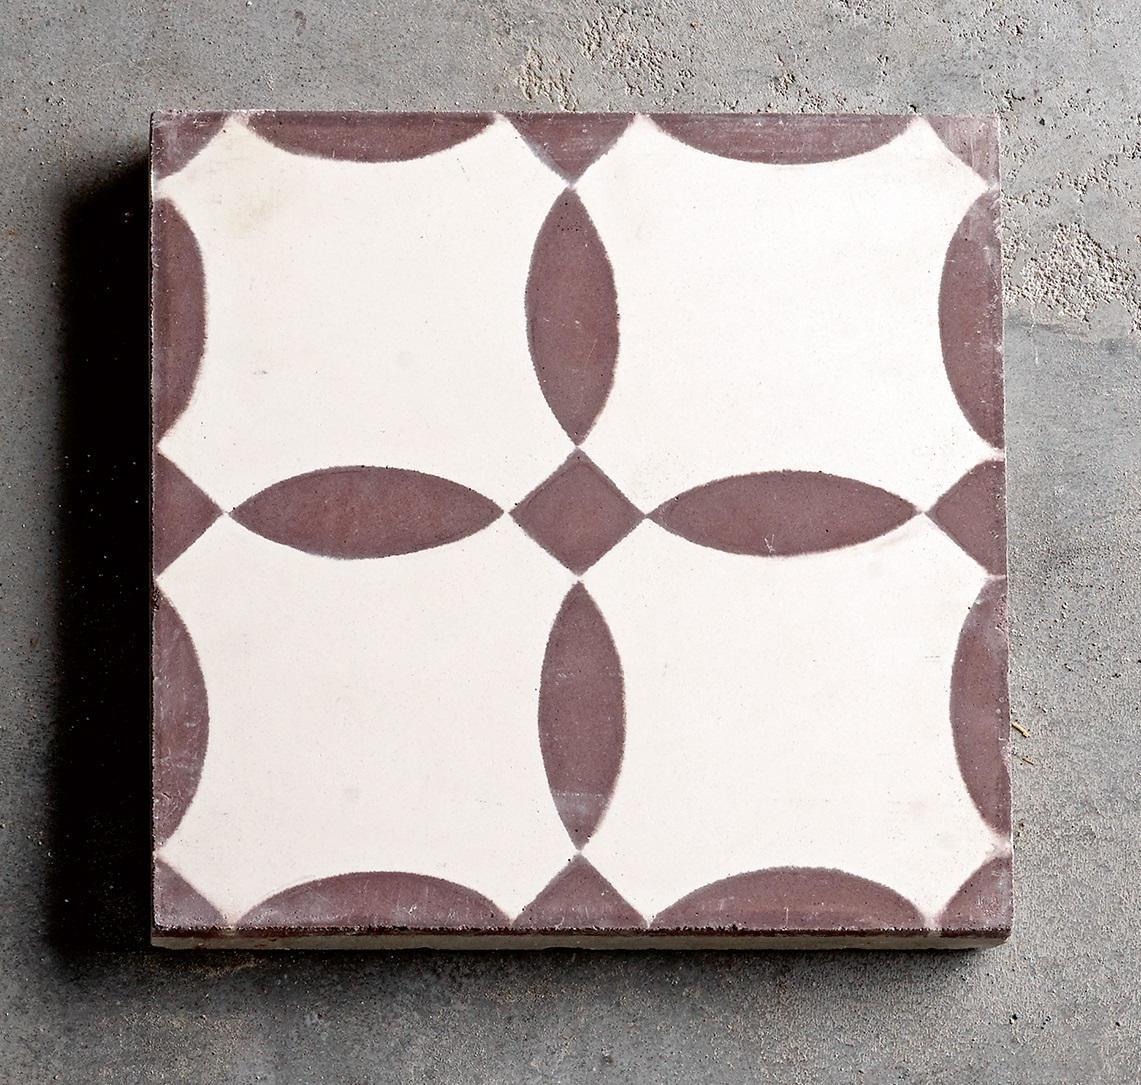 tineKhome Cementová kachle Flower Brown, hnědá barva, beton